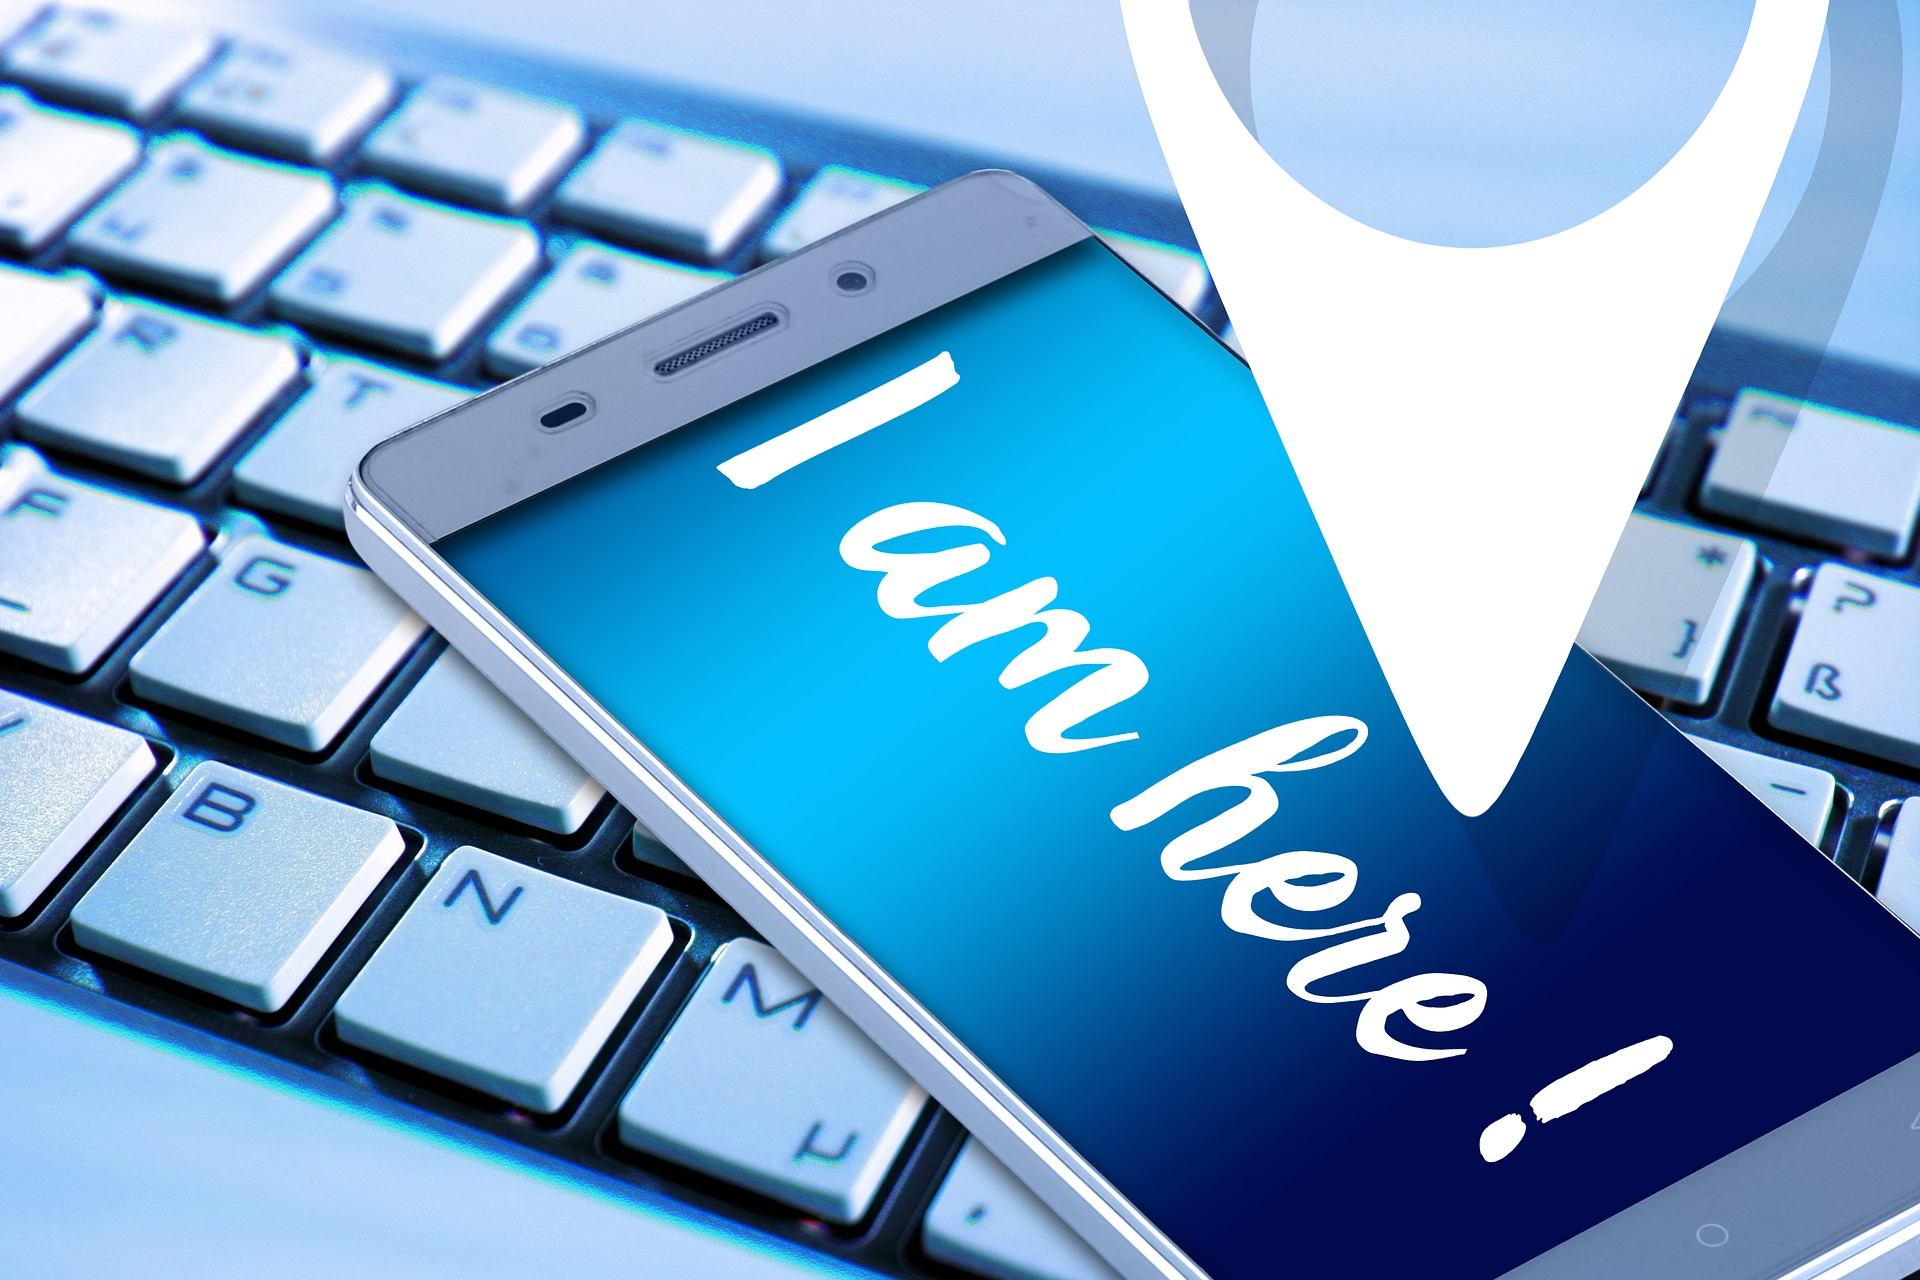 mobile-phone-2398300_1920.jpg